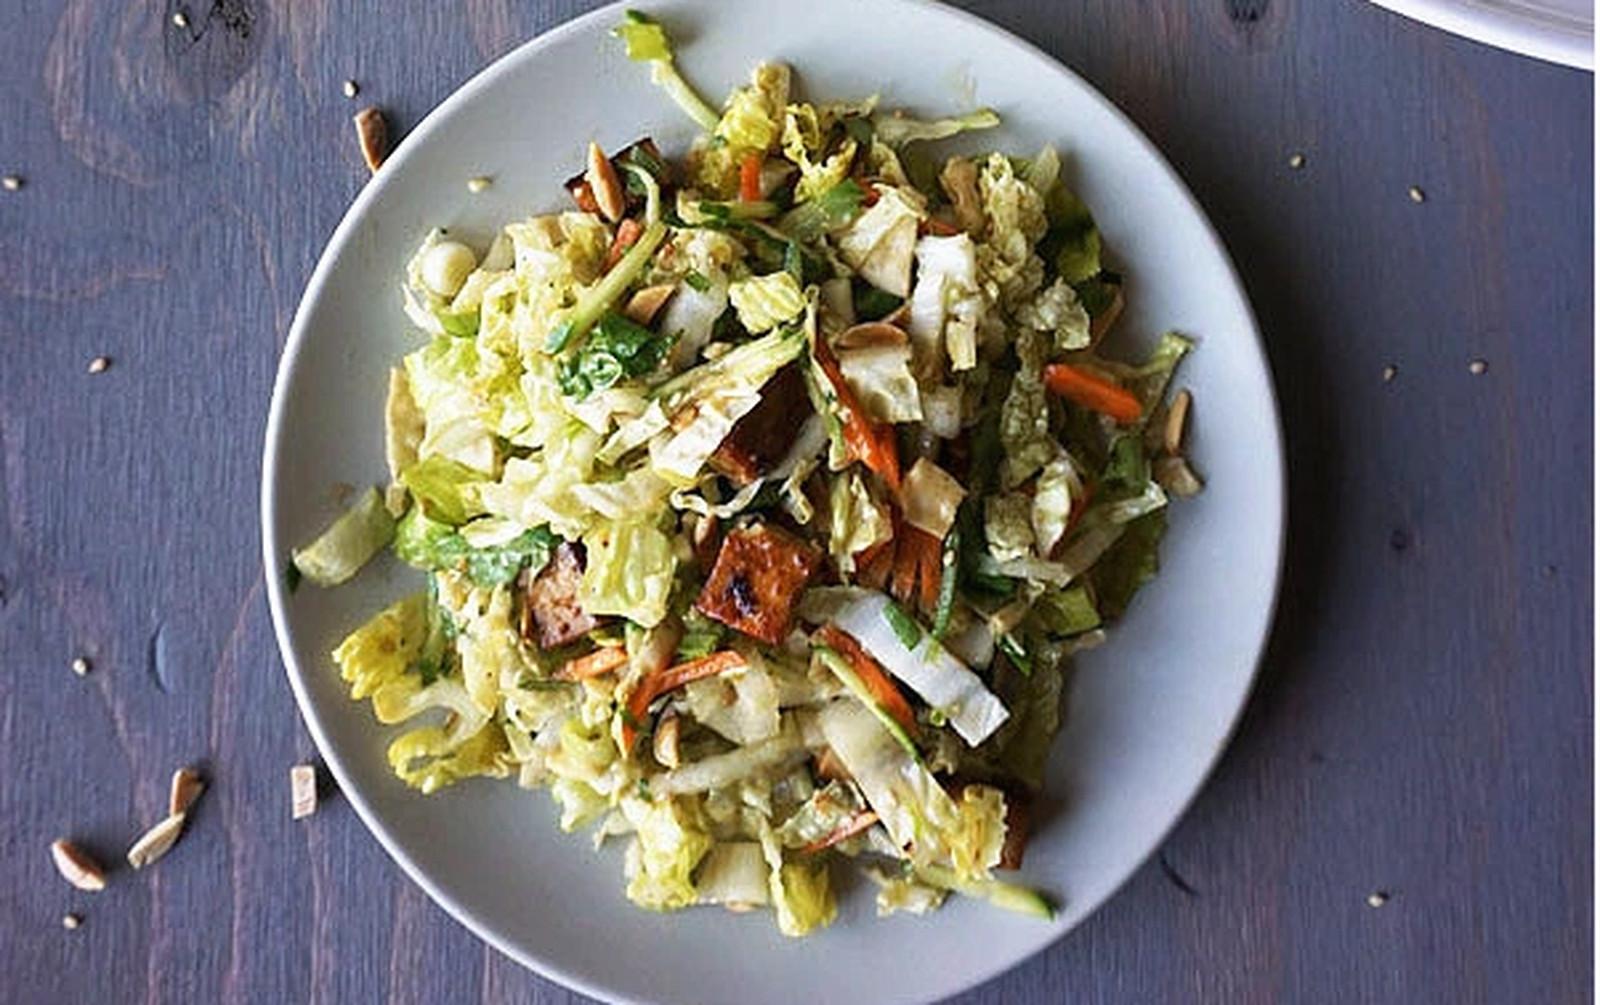 Sesame Crunch Salad [Vegan, Gluten-Free]